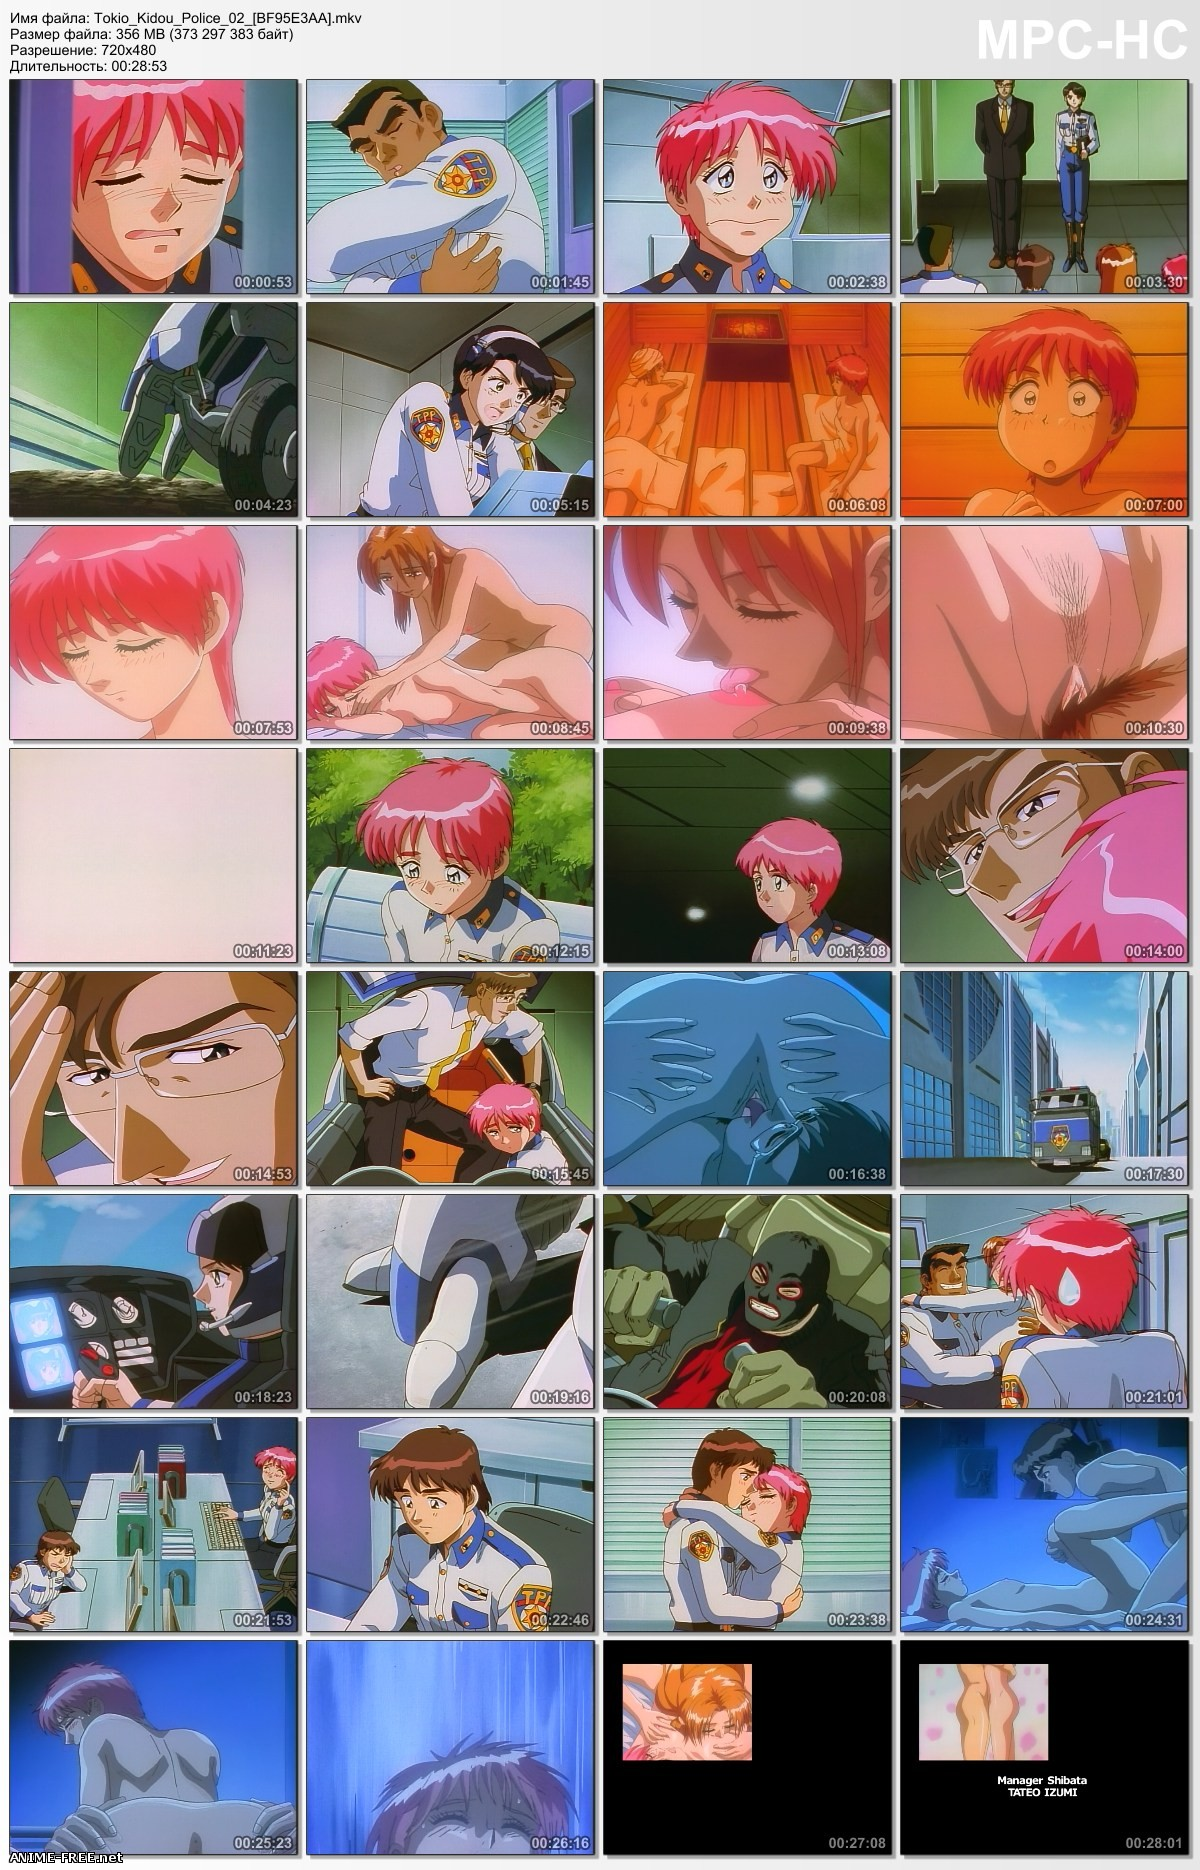 Tokio Private Police / Tokio Mobile Police / Tokio Kidou Police / Токийская Частная Полиция [2 из 2] [RUS,JAP,ENG] Anime Hentai